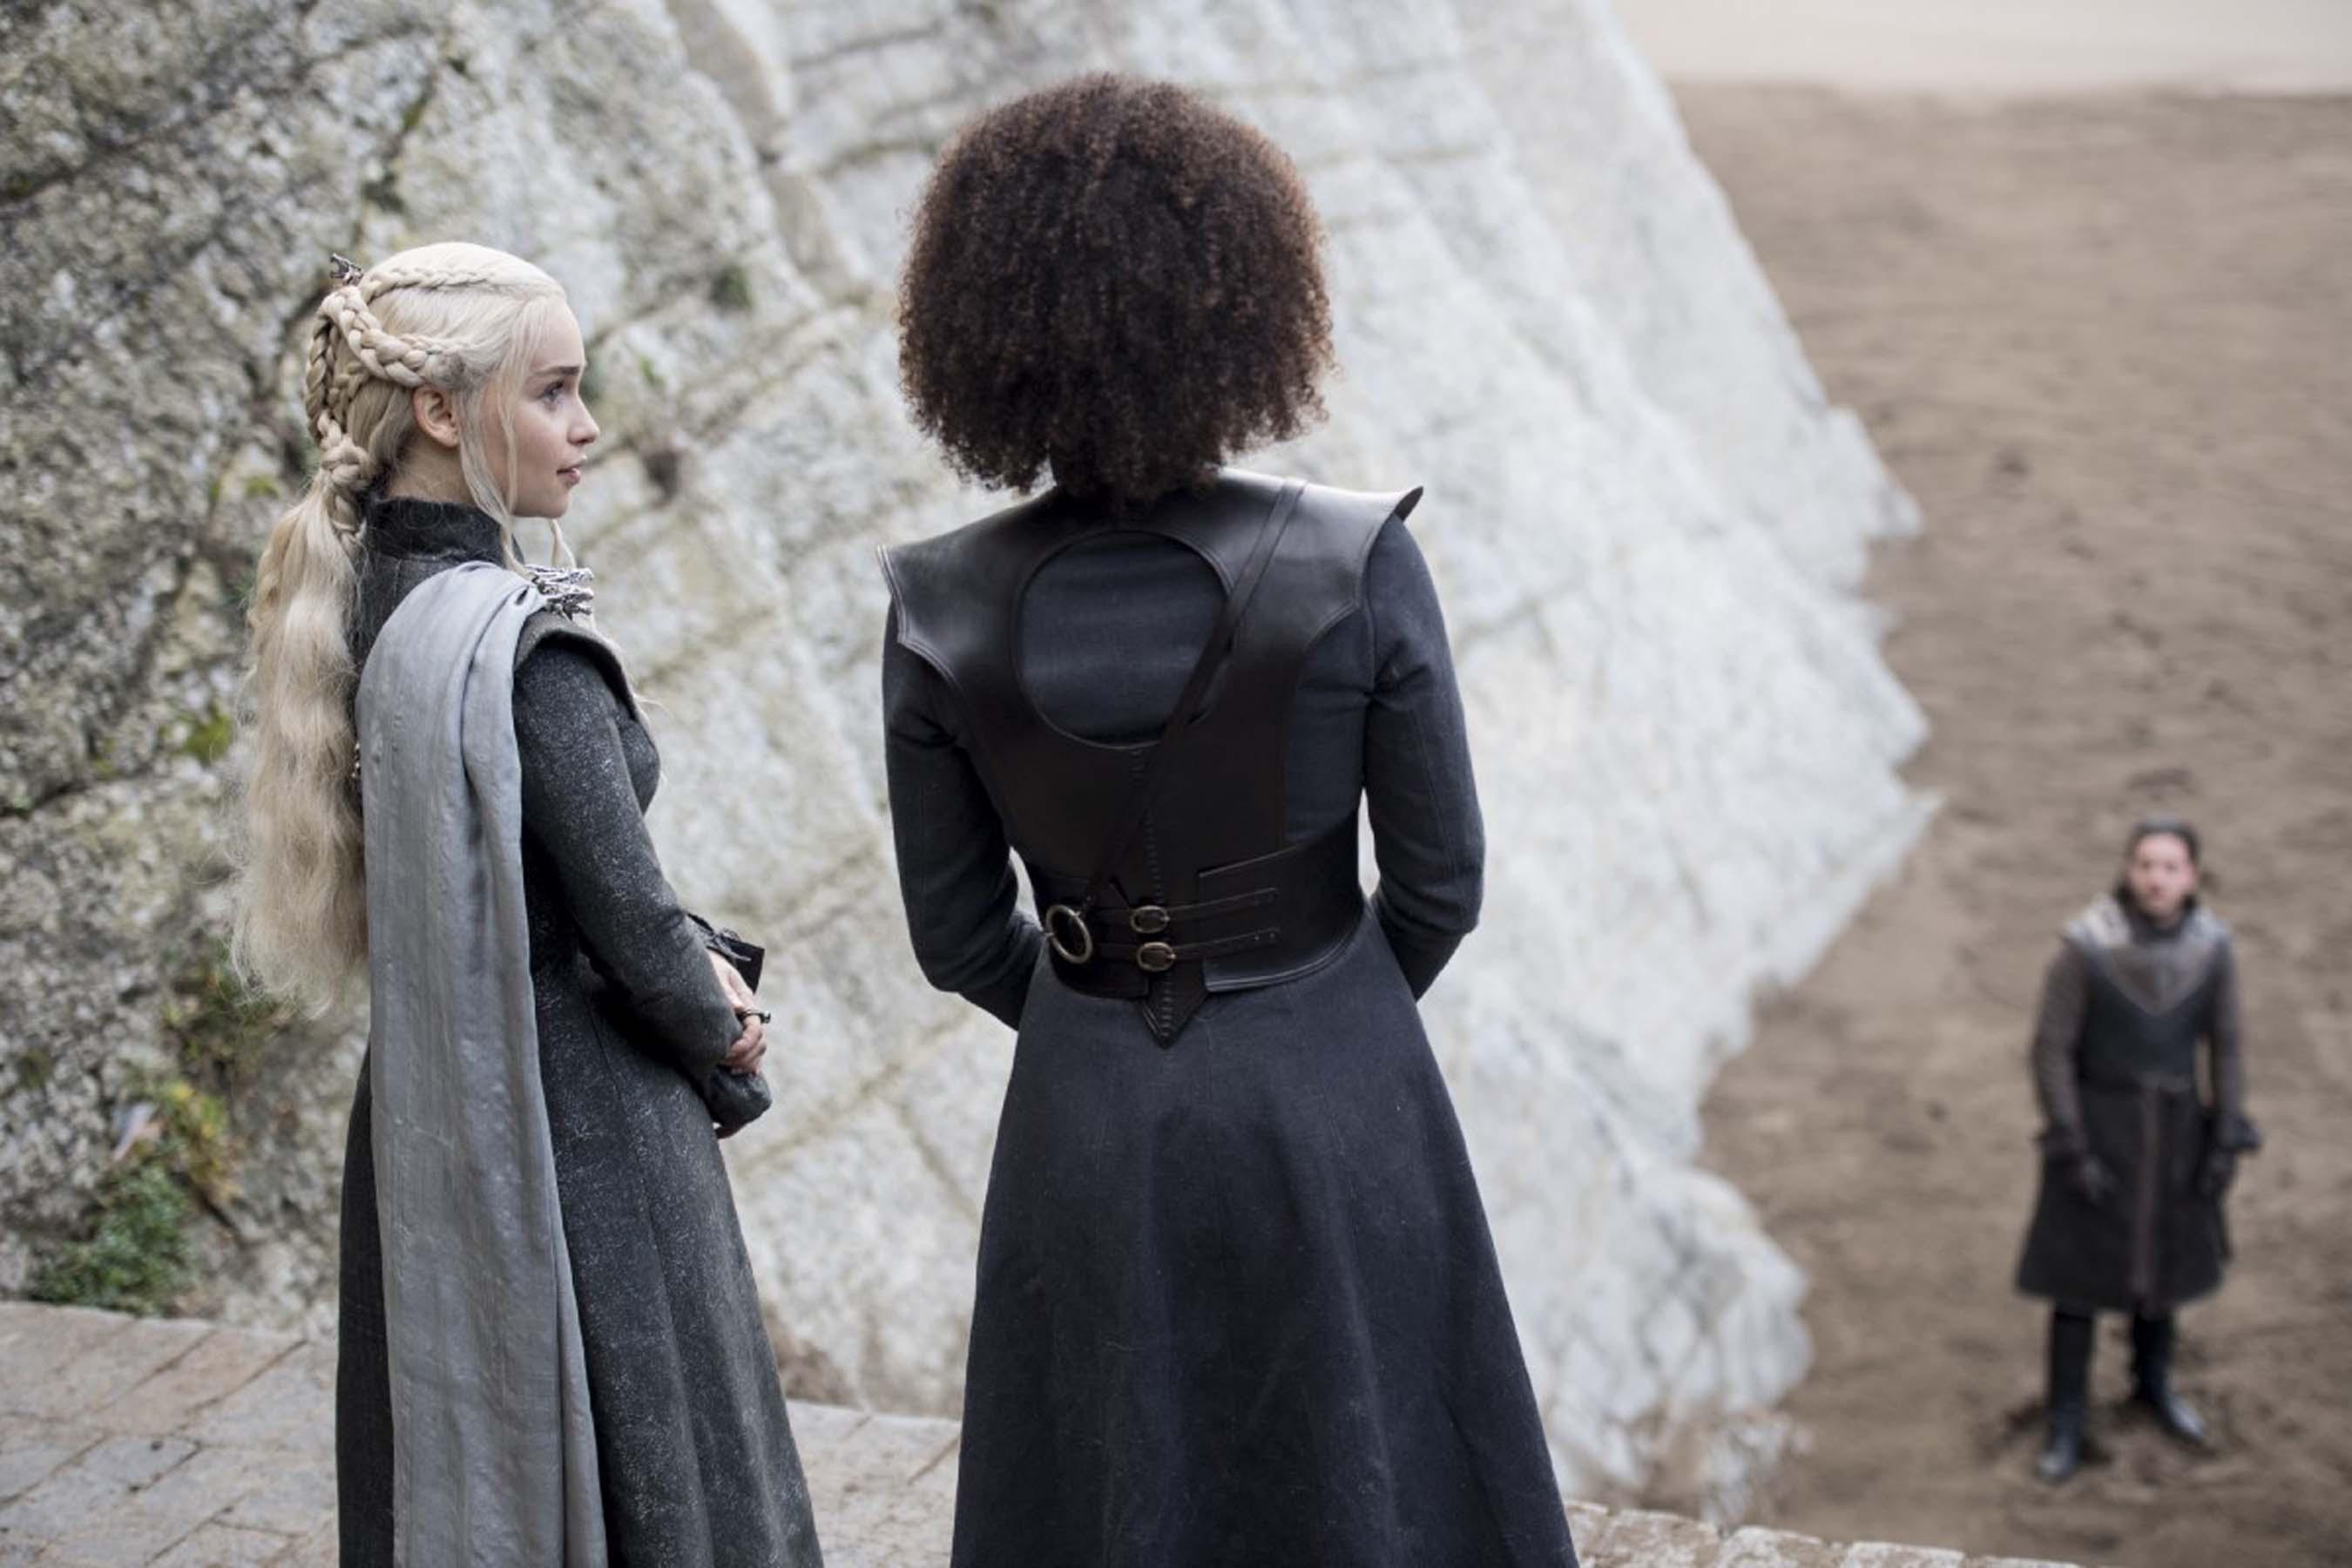 Daenerys Targaryen and Missandei 7x04 - The Spoils of War